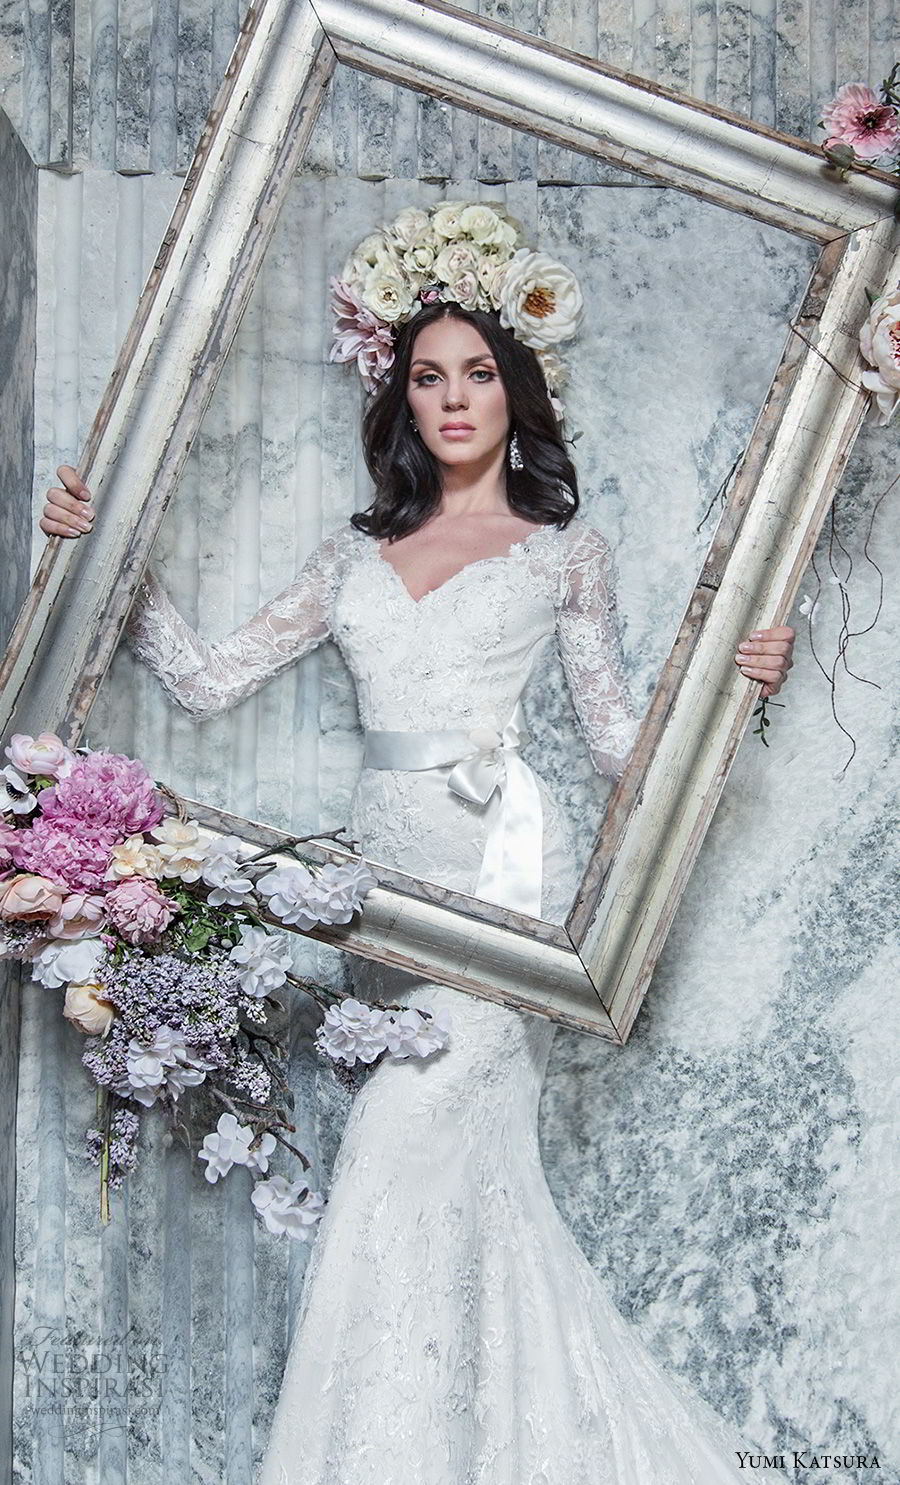 yumi katsura spring 2019 bridal long sleeves v neck full embellishment elegant fit and flare wedding dress long train (13) zv